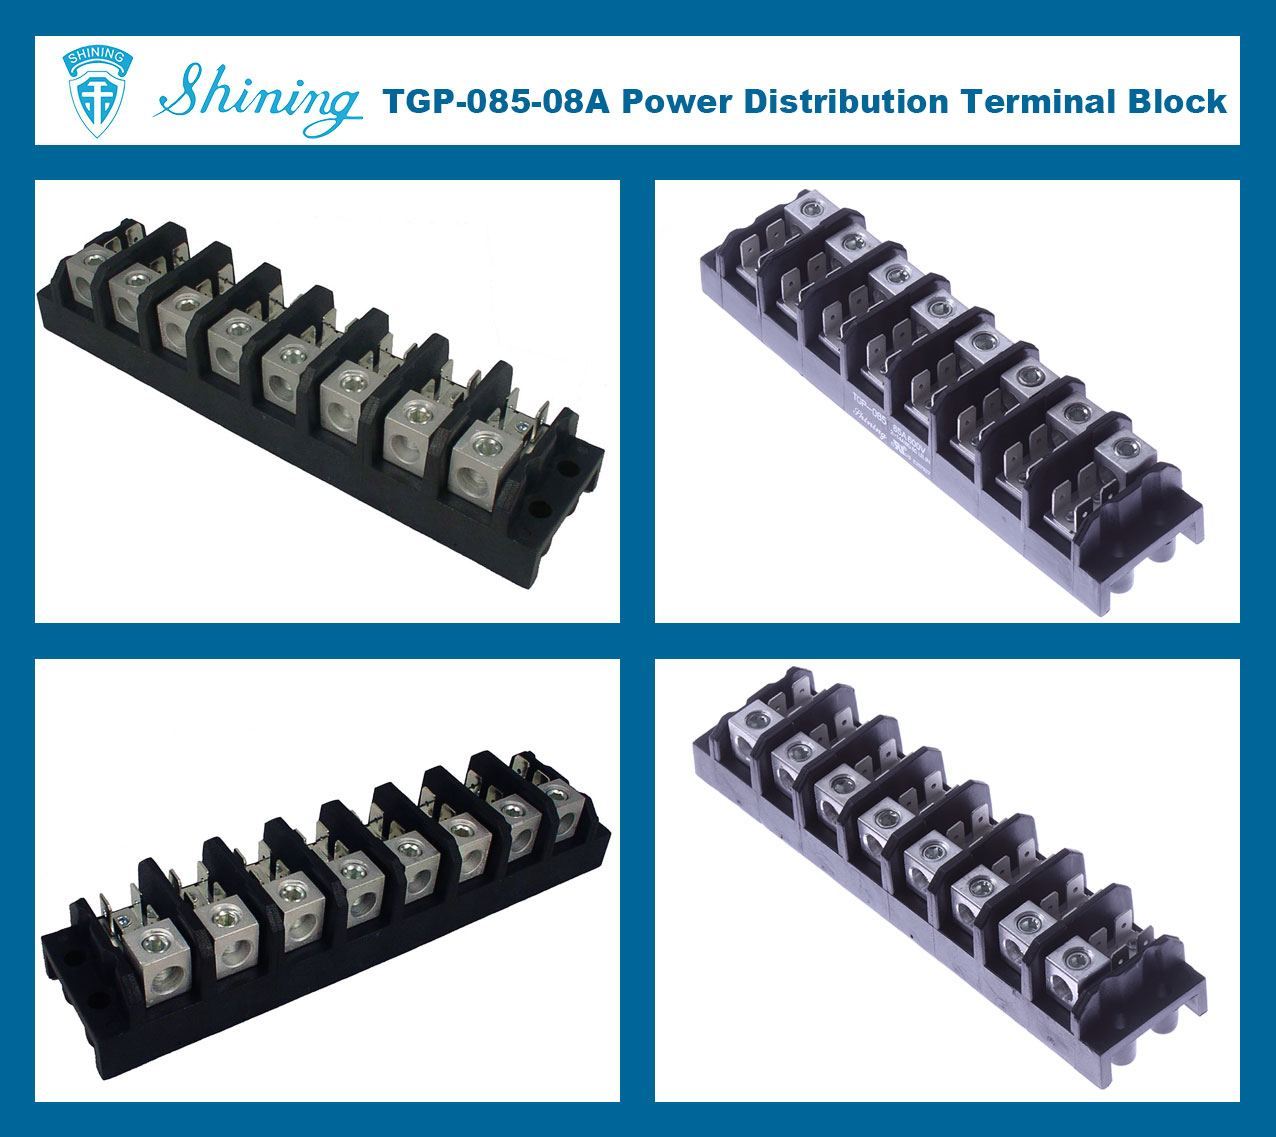 SHINING-TGP-085-08A 600V 85A 8 Pole Electrical Power Terminal Block